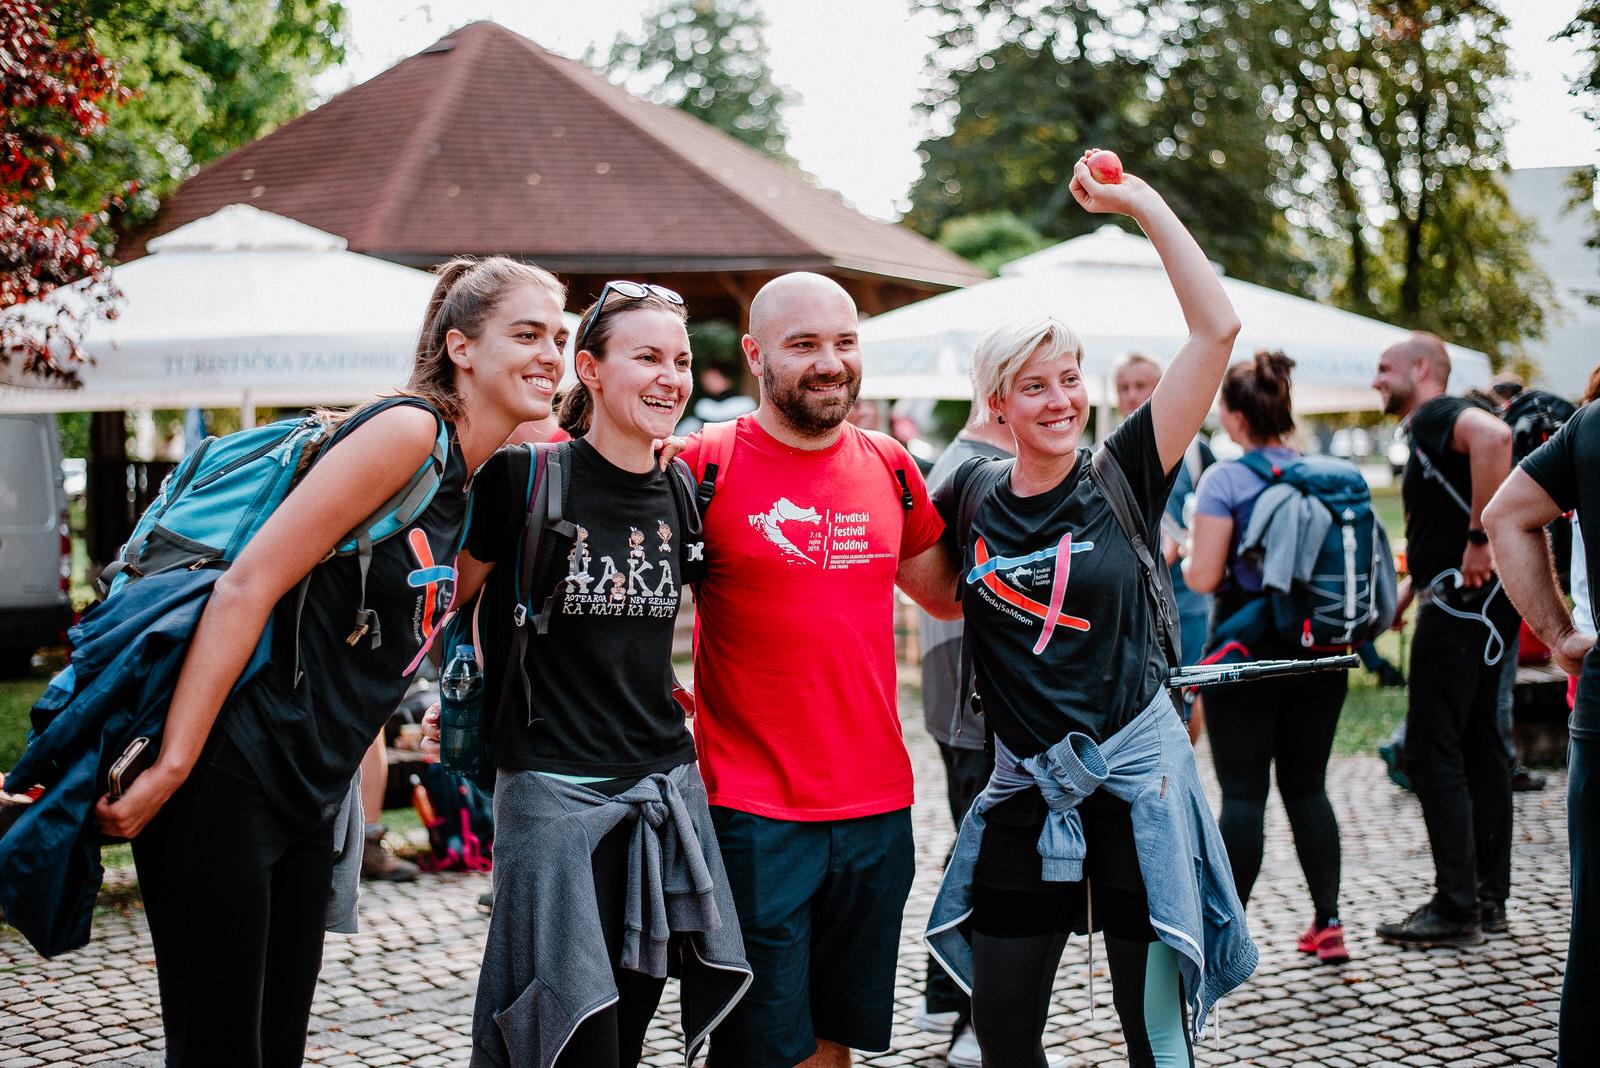 likaclub_otočac_hrvatski-festival-hodanja_2019-14